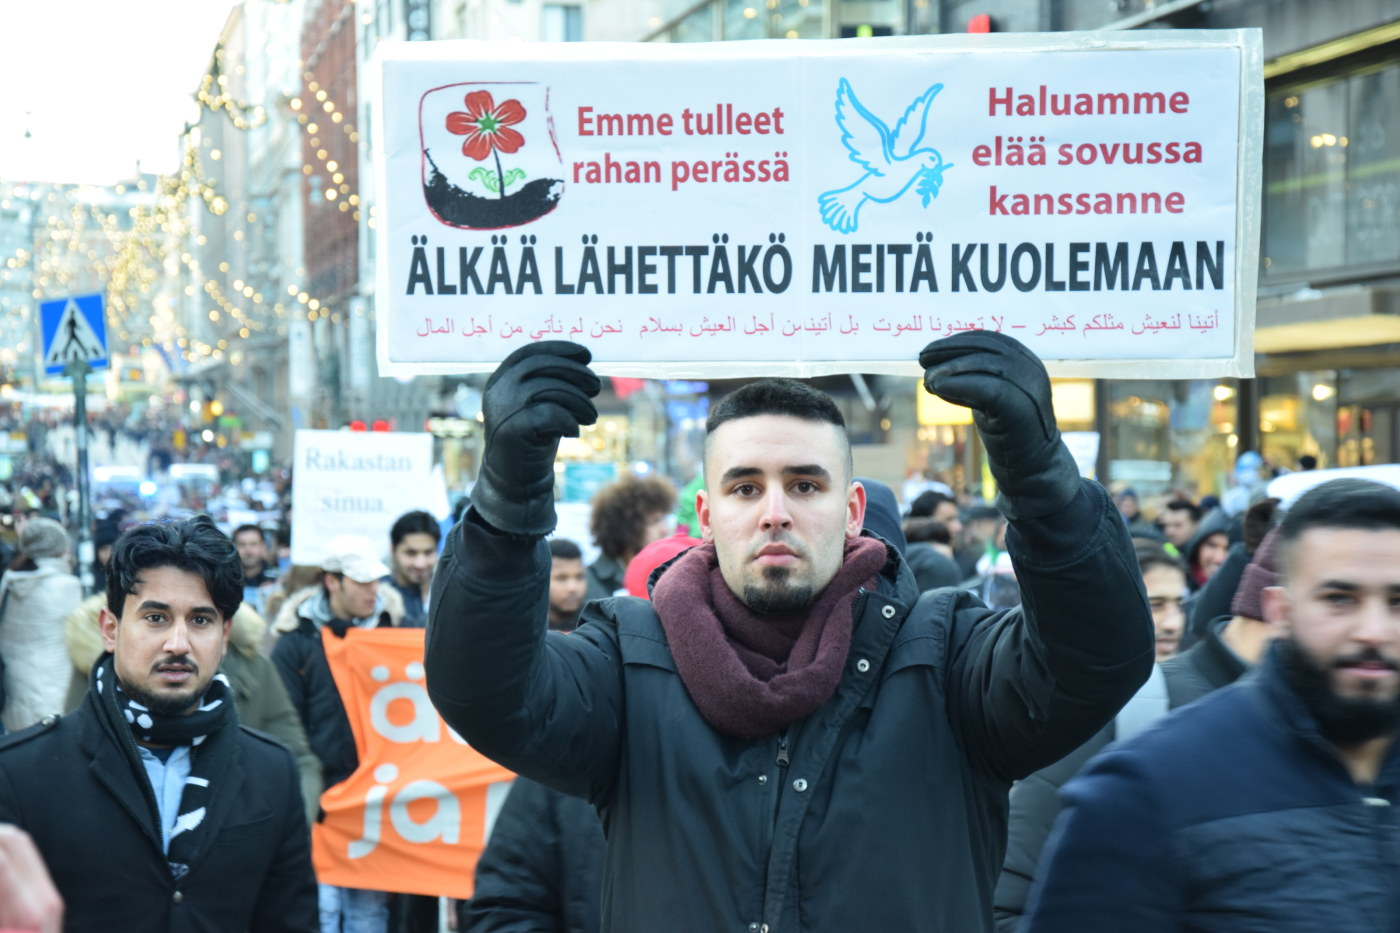 Flera gripna efter demonstrationer i finland